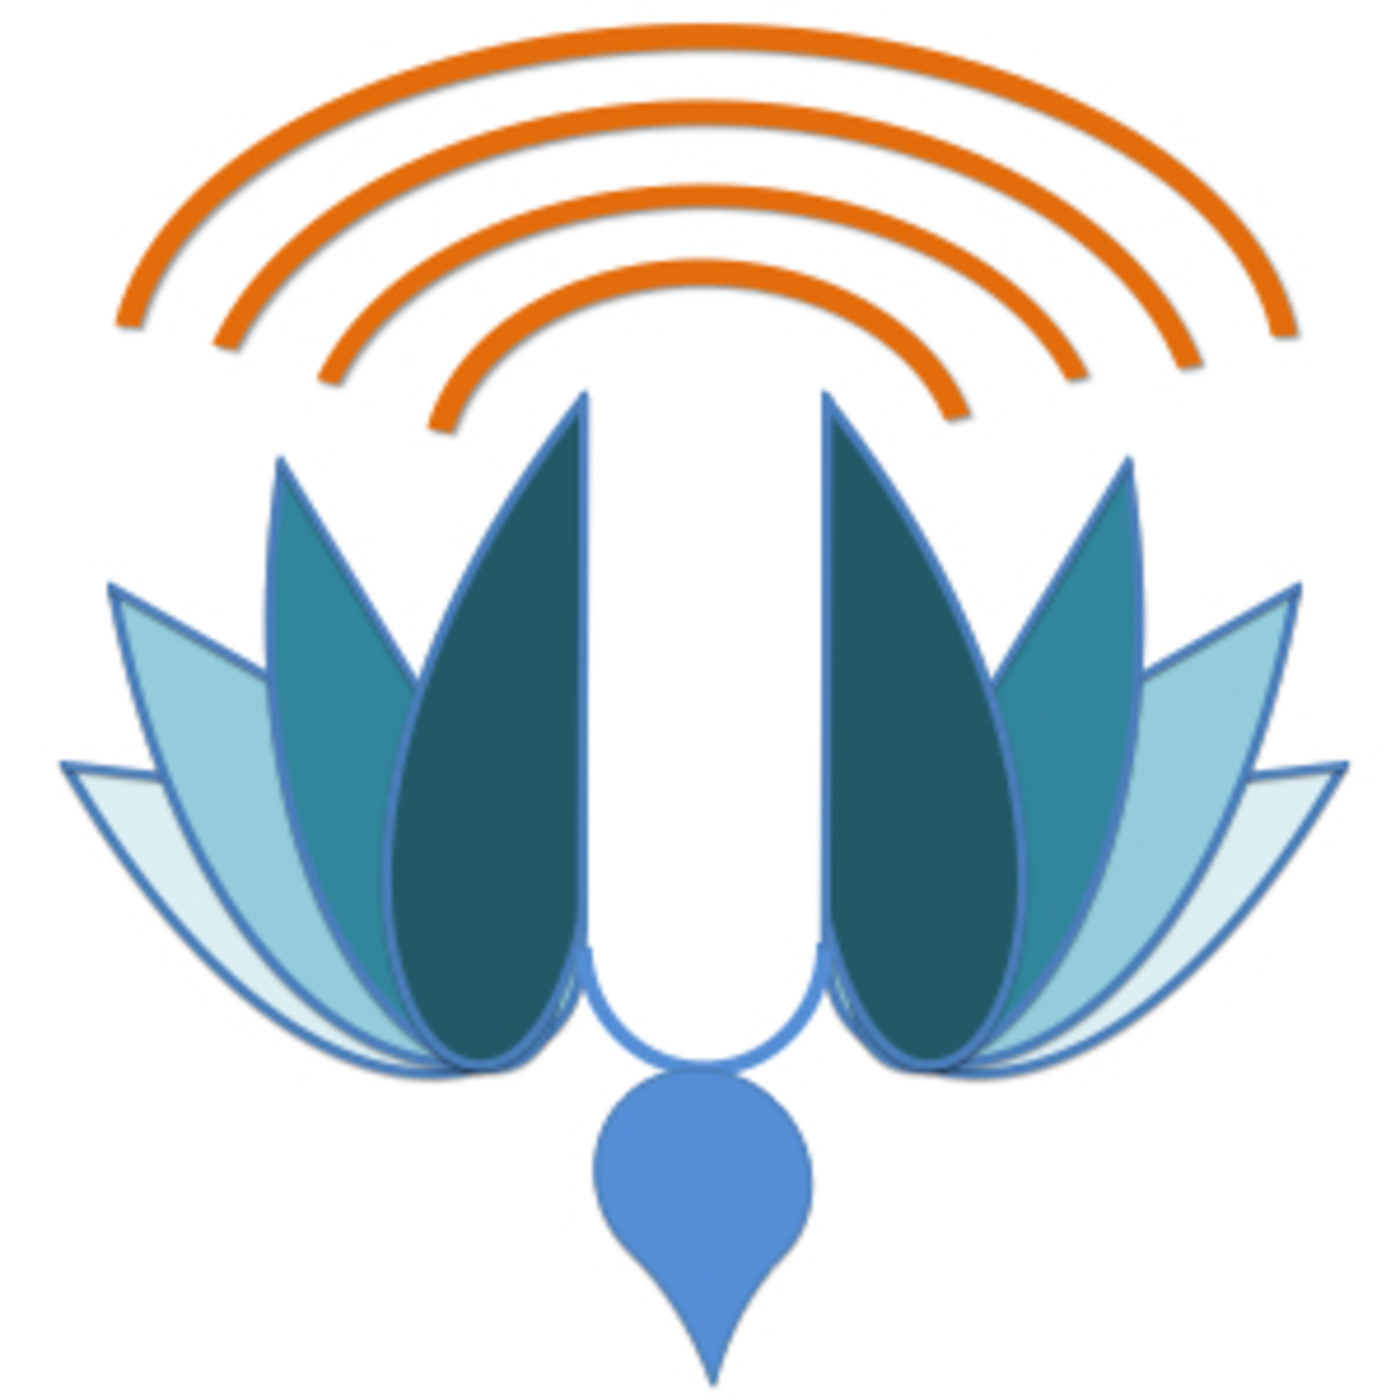 A2--Ramayana - Significance of an intermediary, Detroit Jan 2020